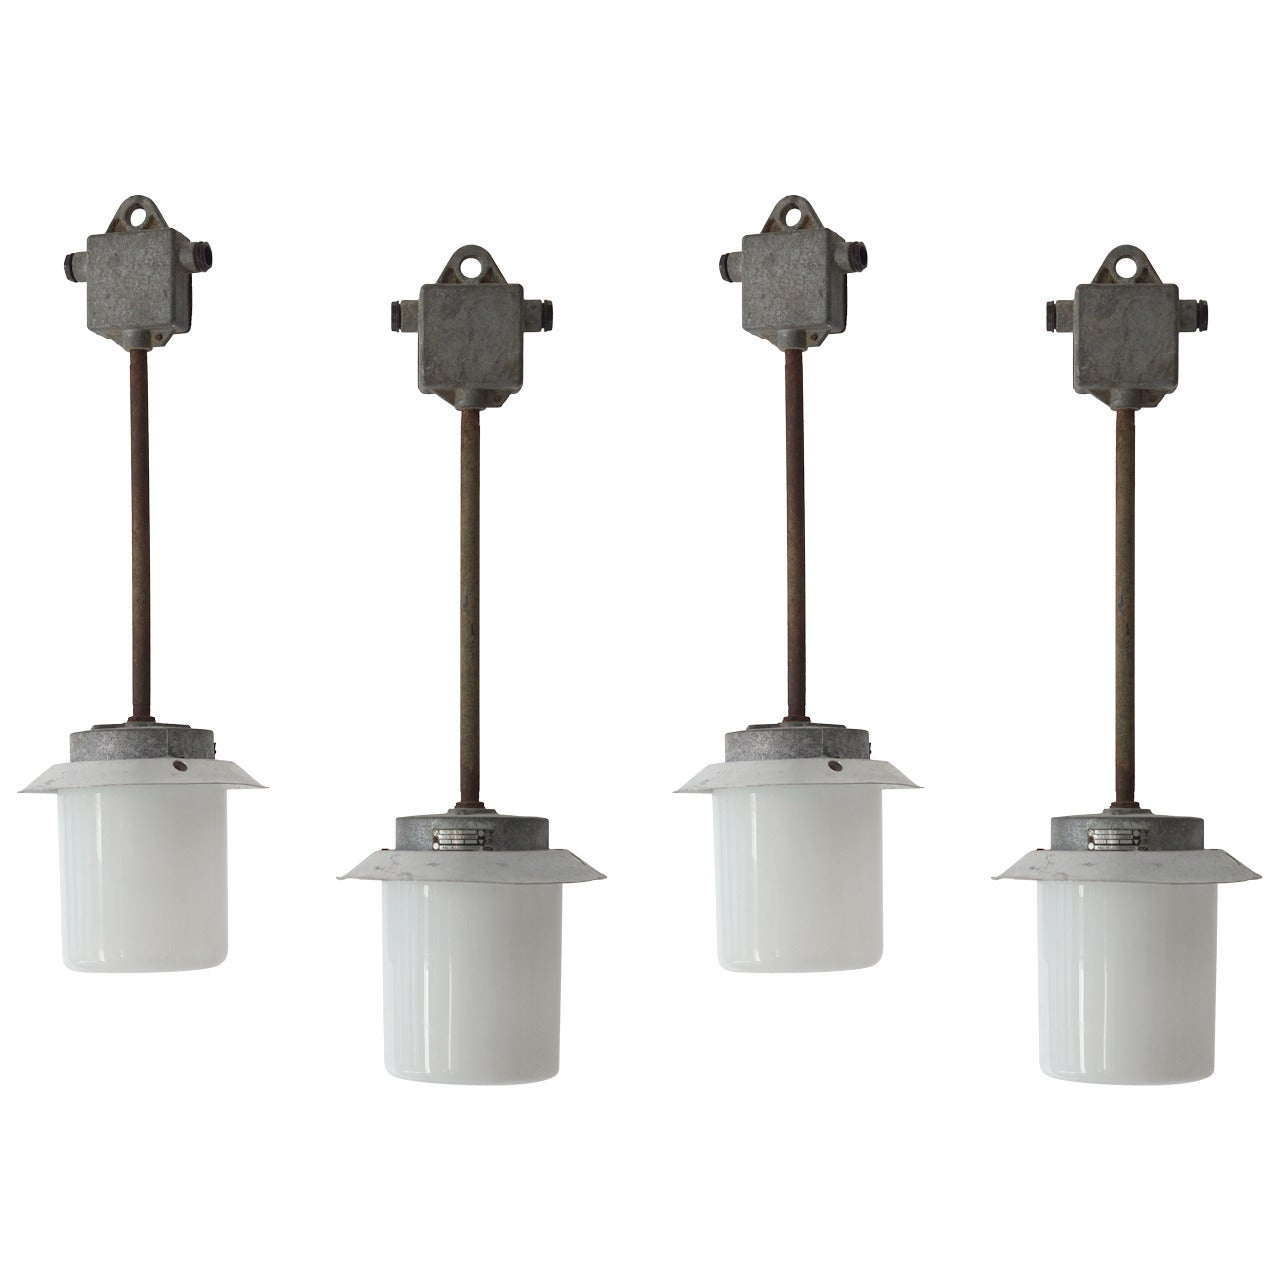 Set of Four Industrial Lights